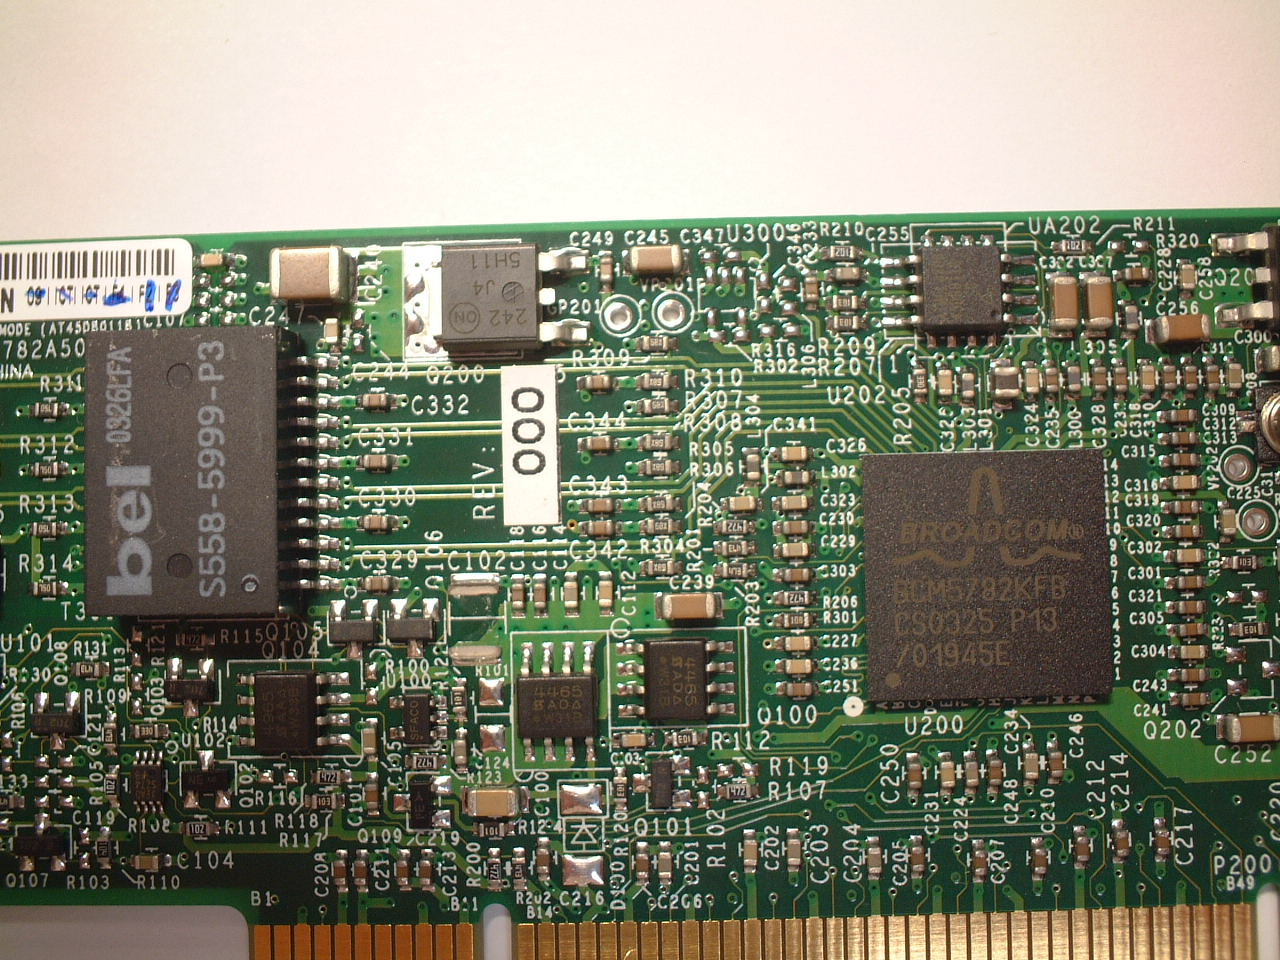 broadcom netxtreme 57xx gigabit controller 8.27.1